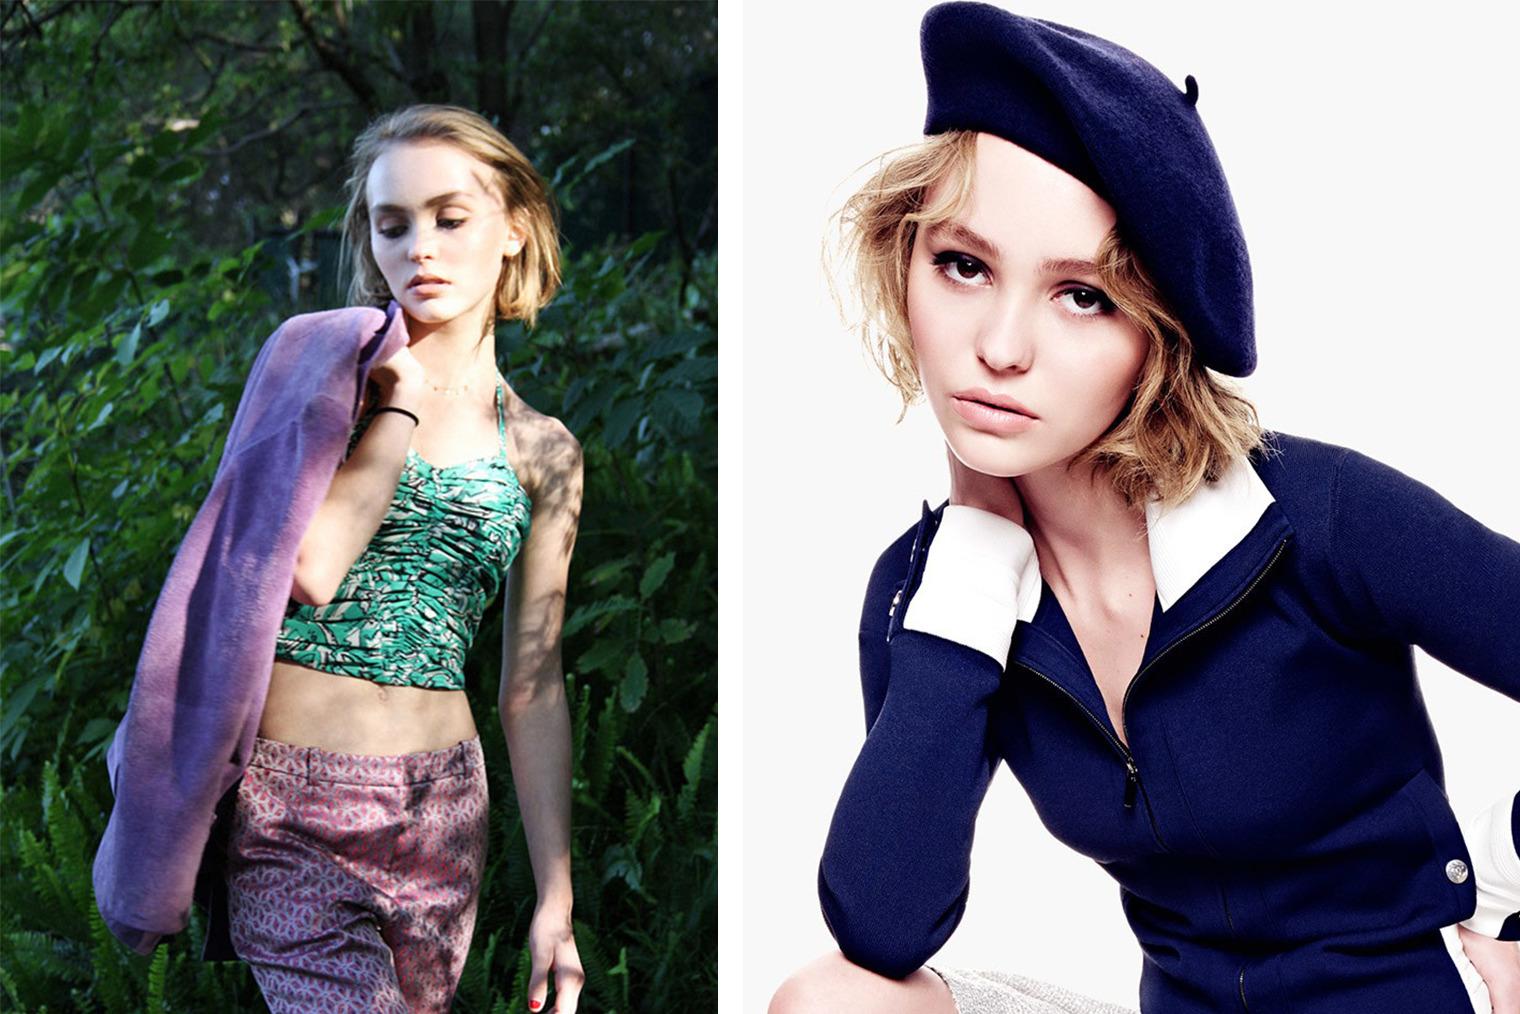 Лили-Роуз Депп, фото: eonline.com, vanityfair.com